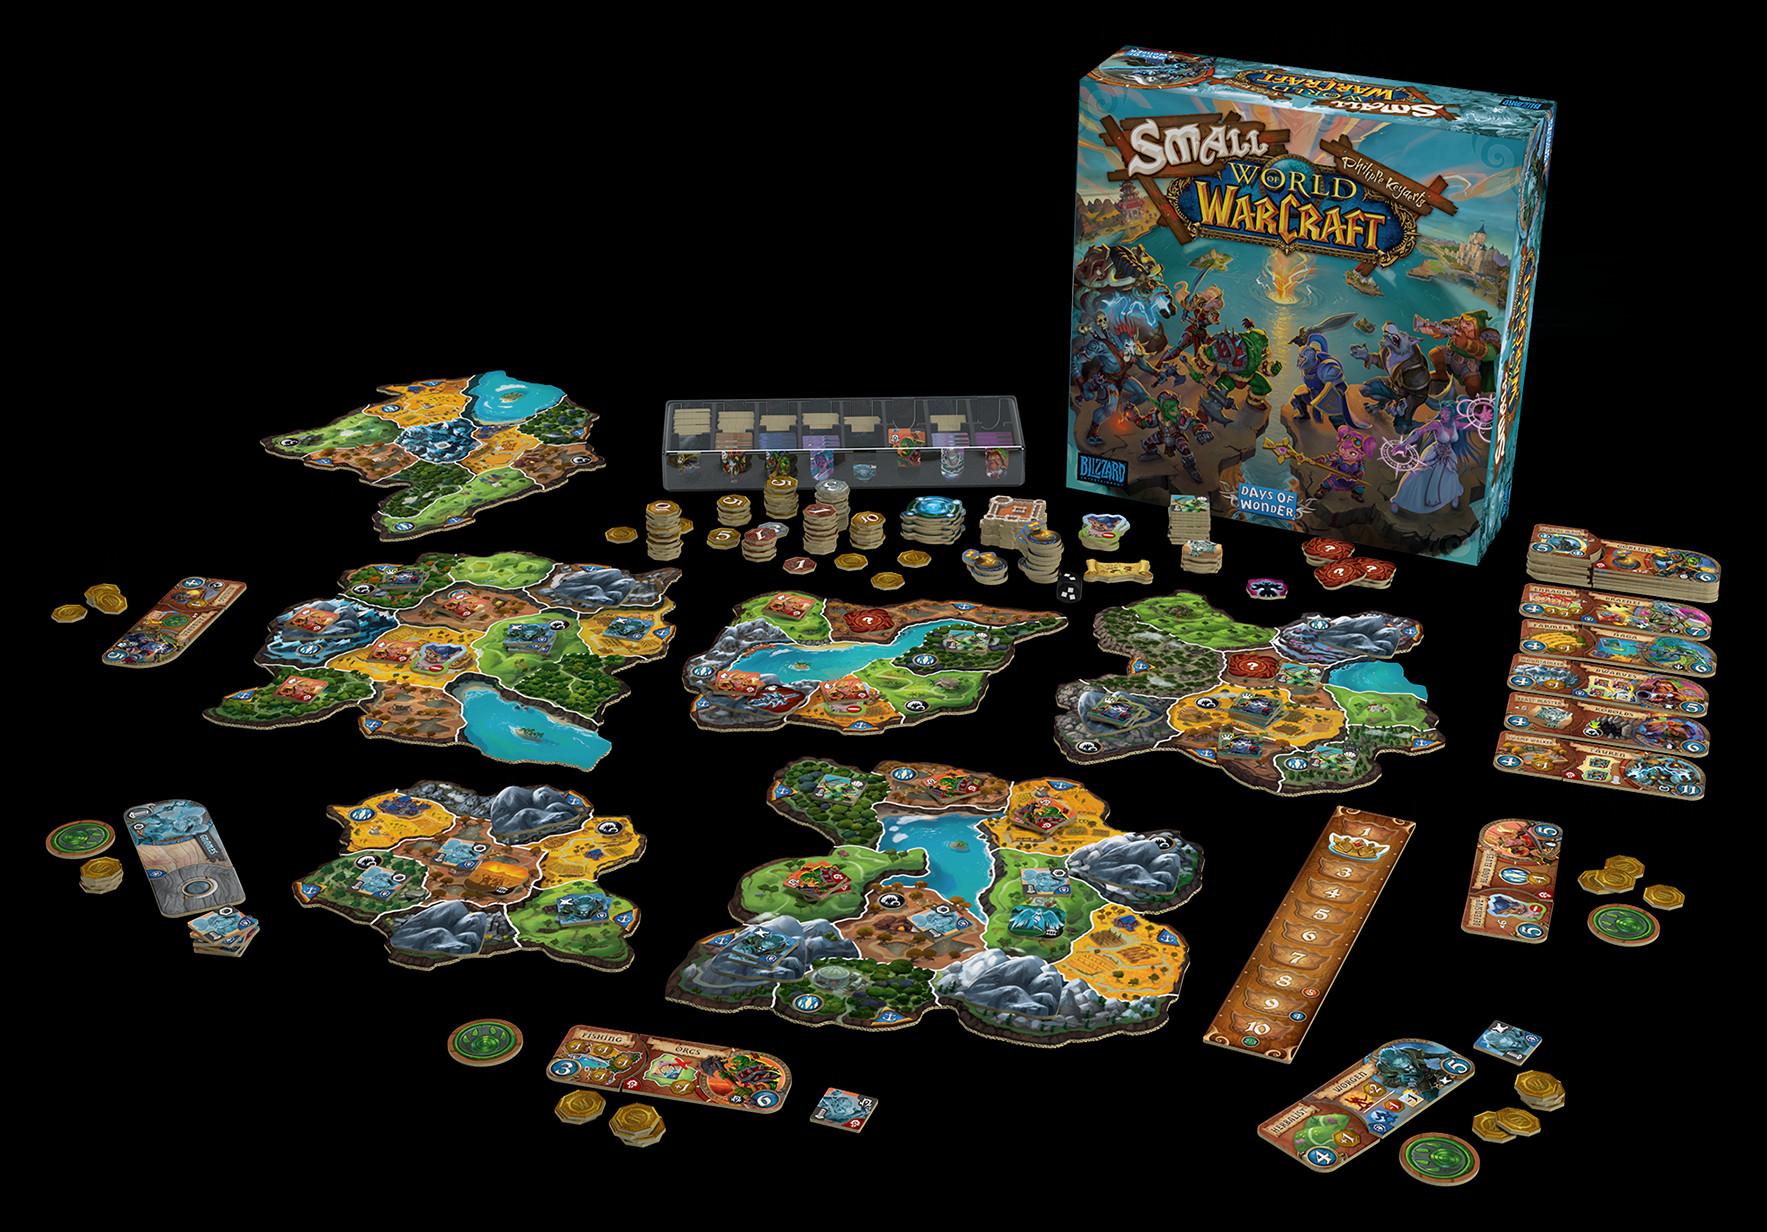 warcraft gioco da tavolo days of wonder